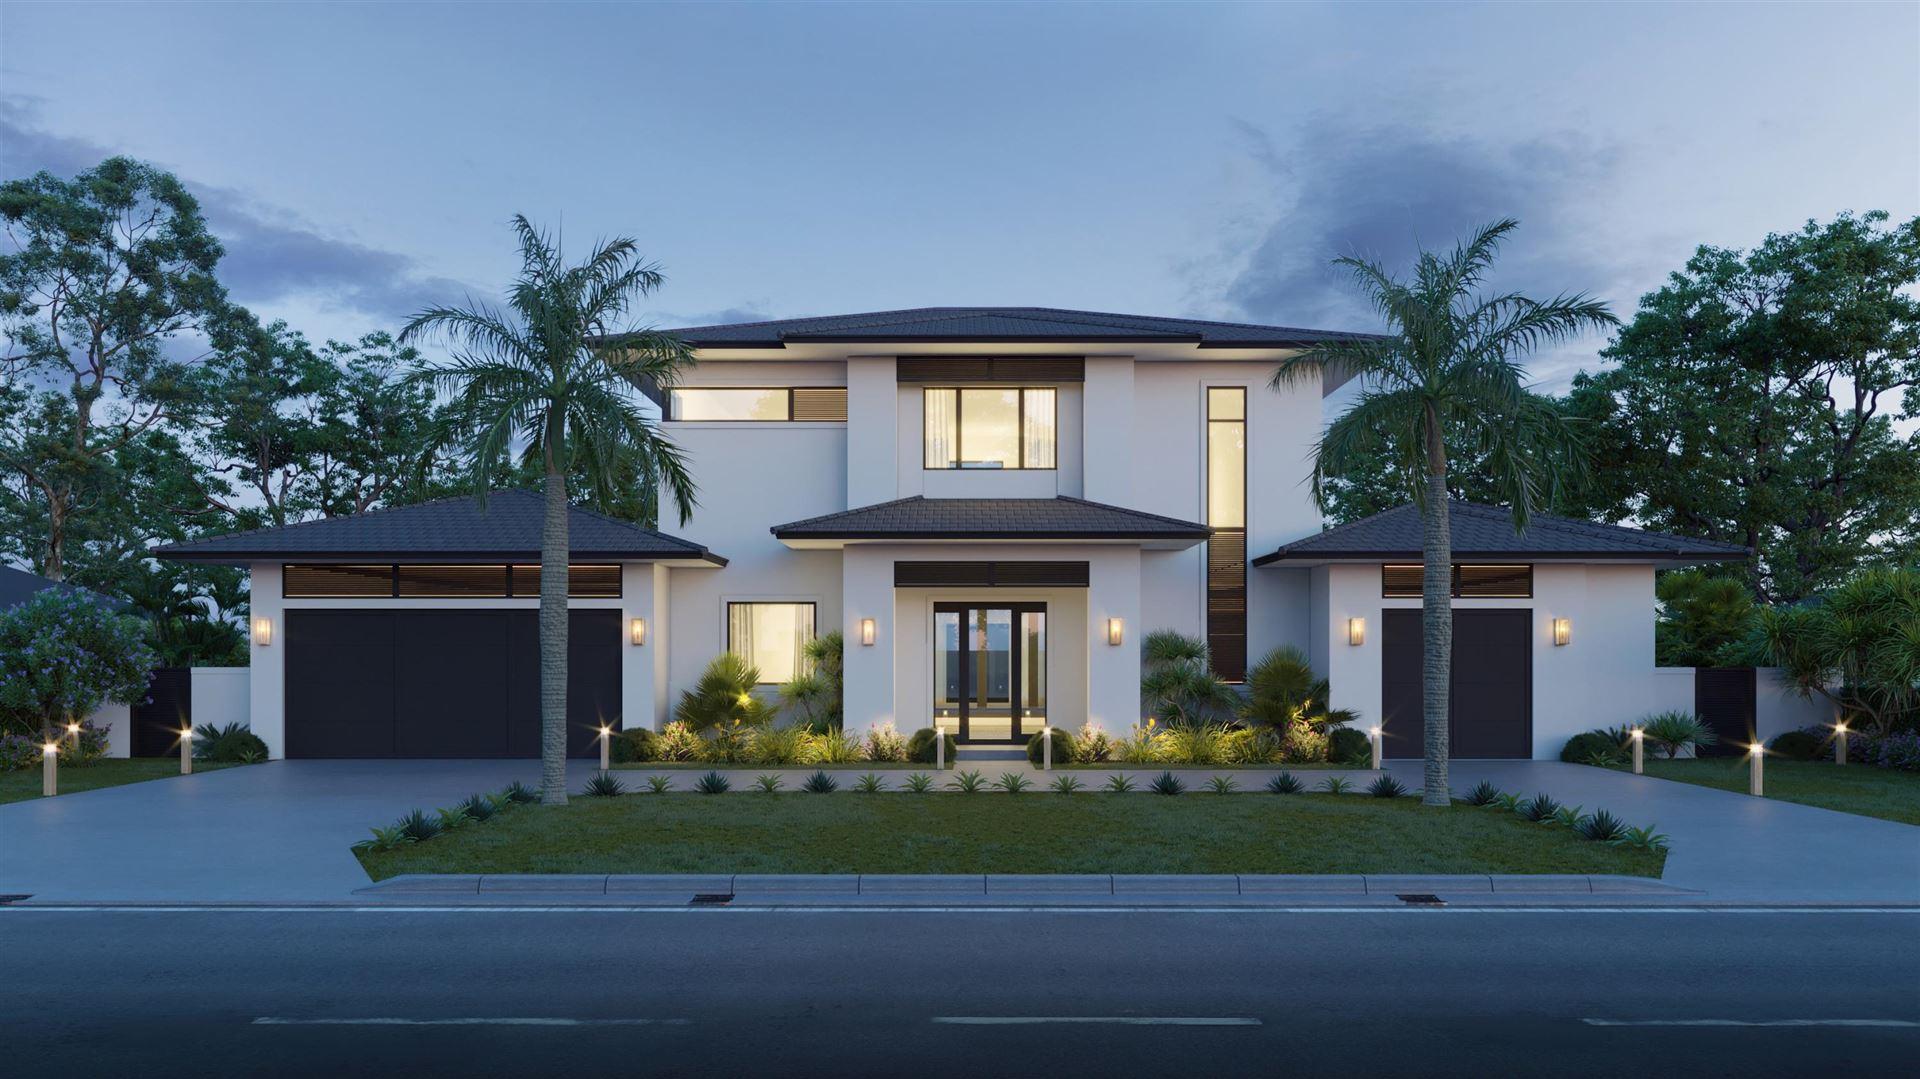 130 Pineapple Road, Delray Beach, FL 33444 - MLS#: RX-10735979